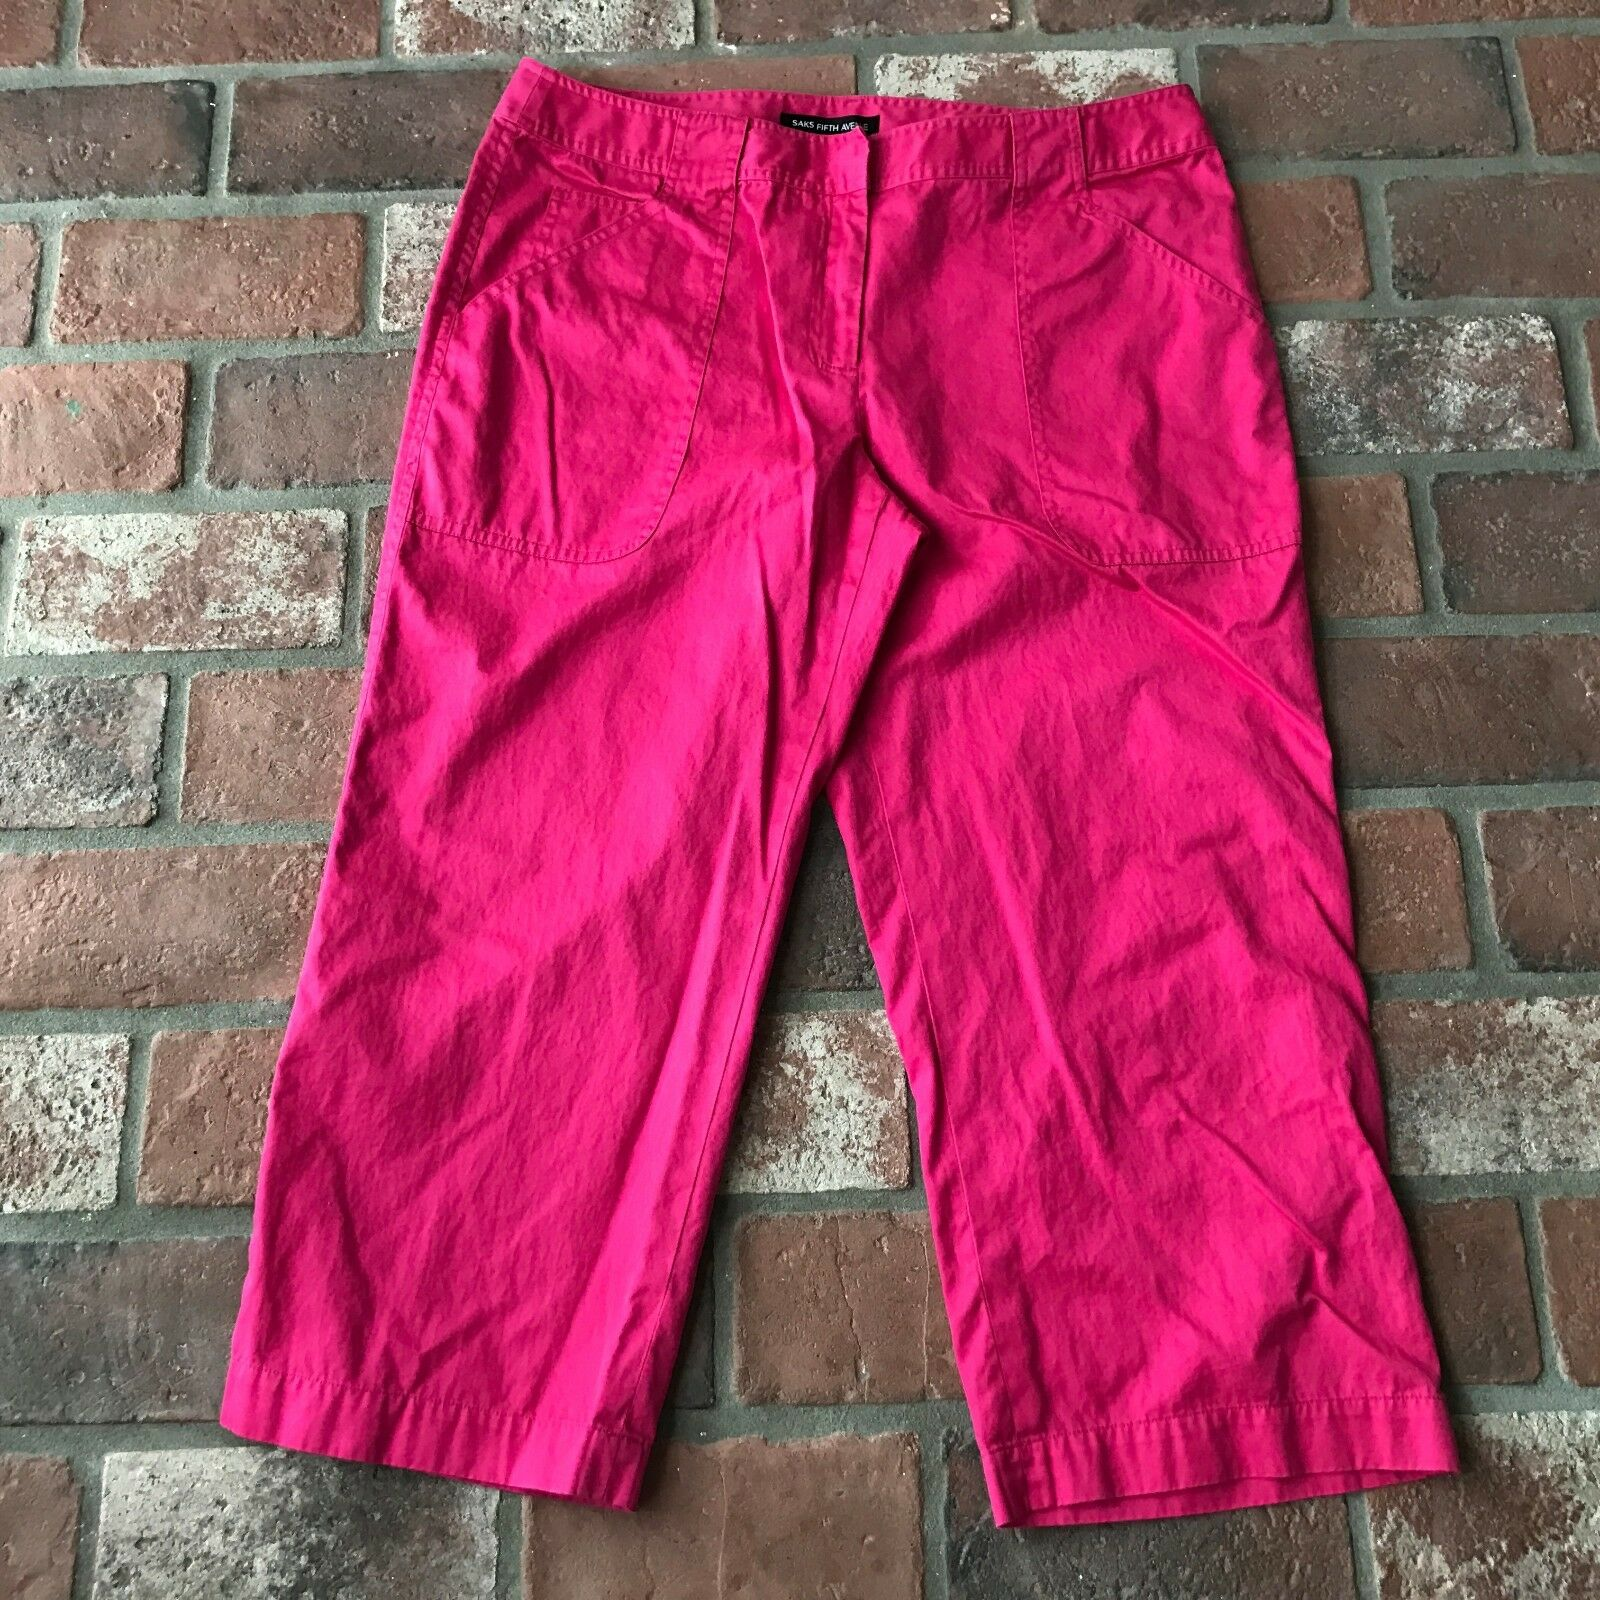 Saks Fifth Avenue Pink Women's Size 12 Capri Pants